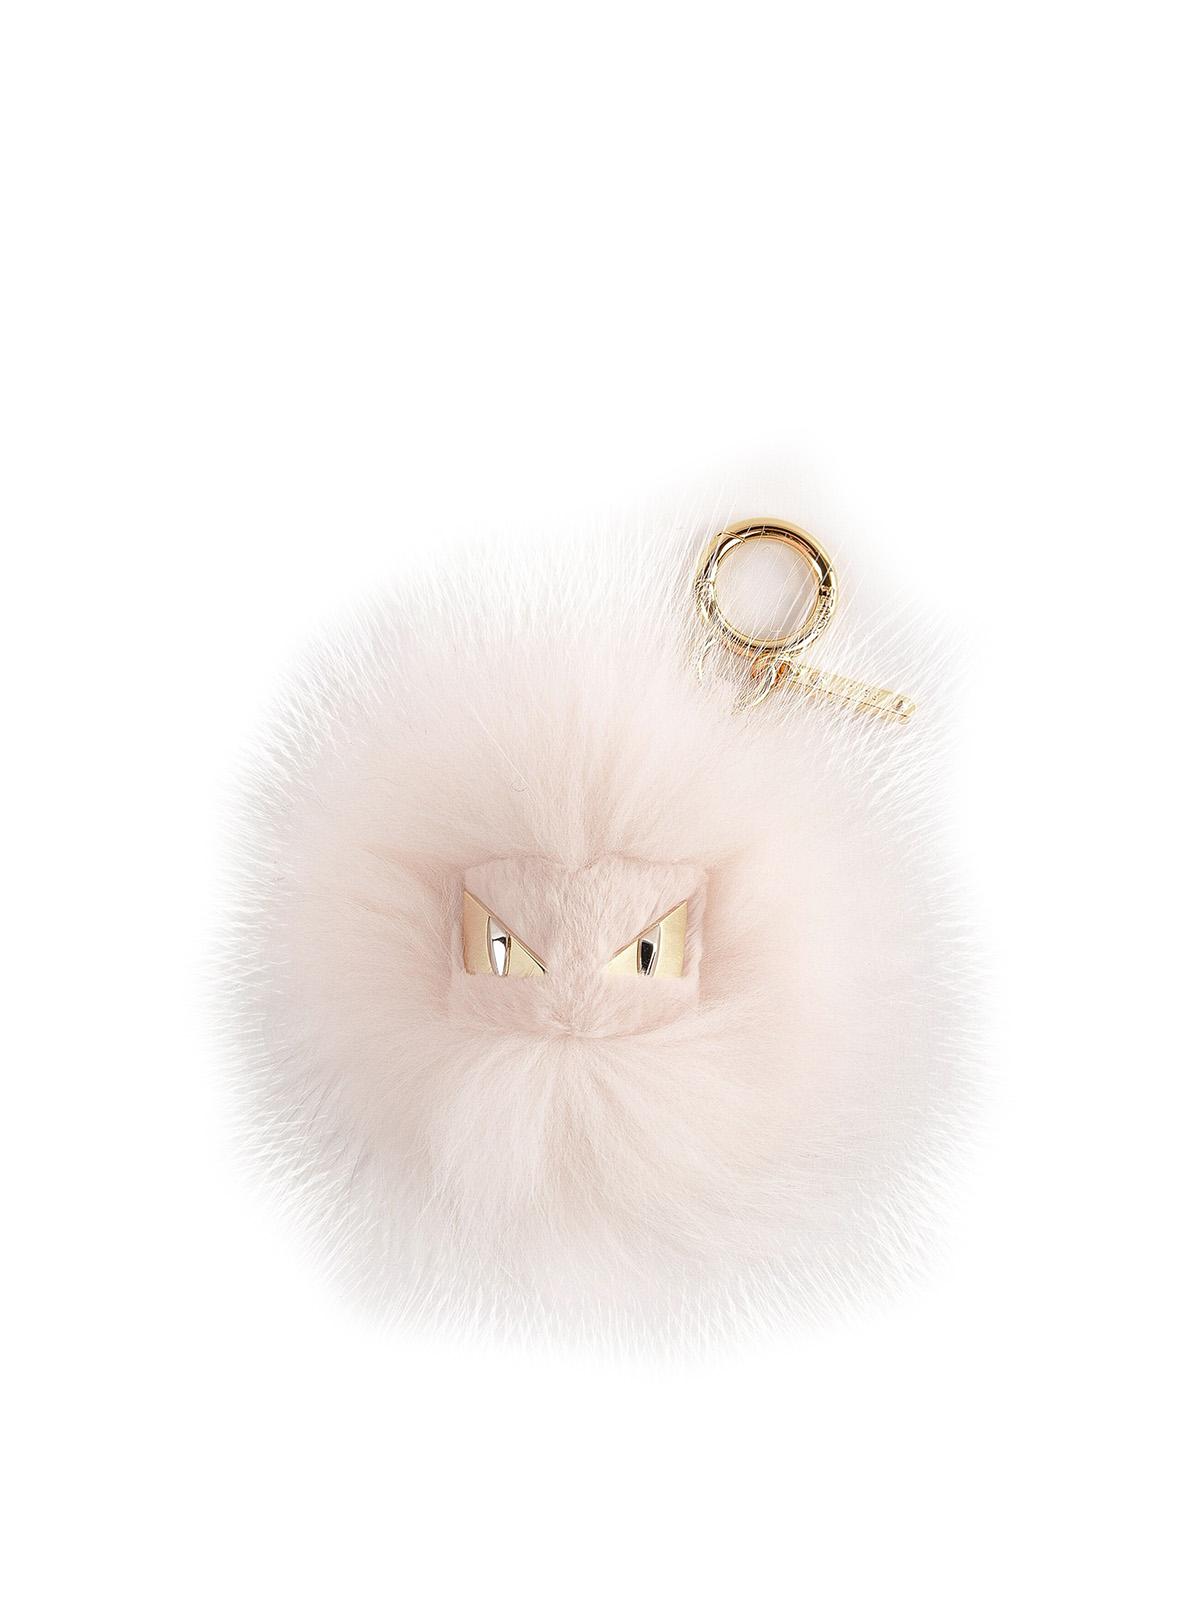 303ddaac49 Fendi - Pink dyed real fur charm bag Bugs - key holders ...